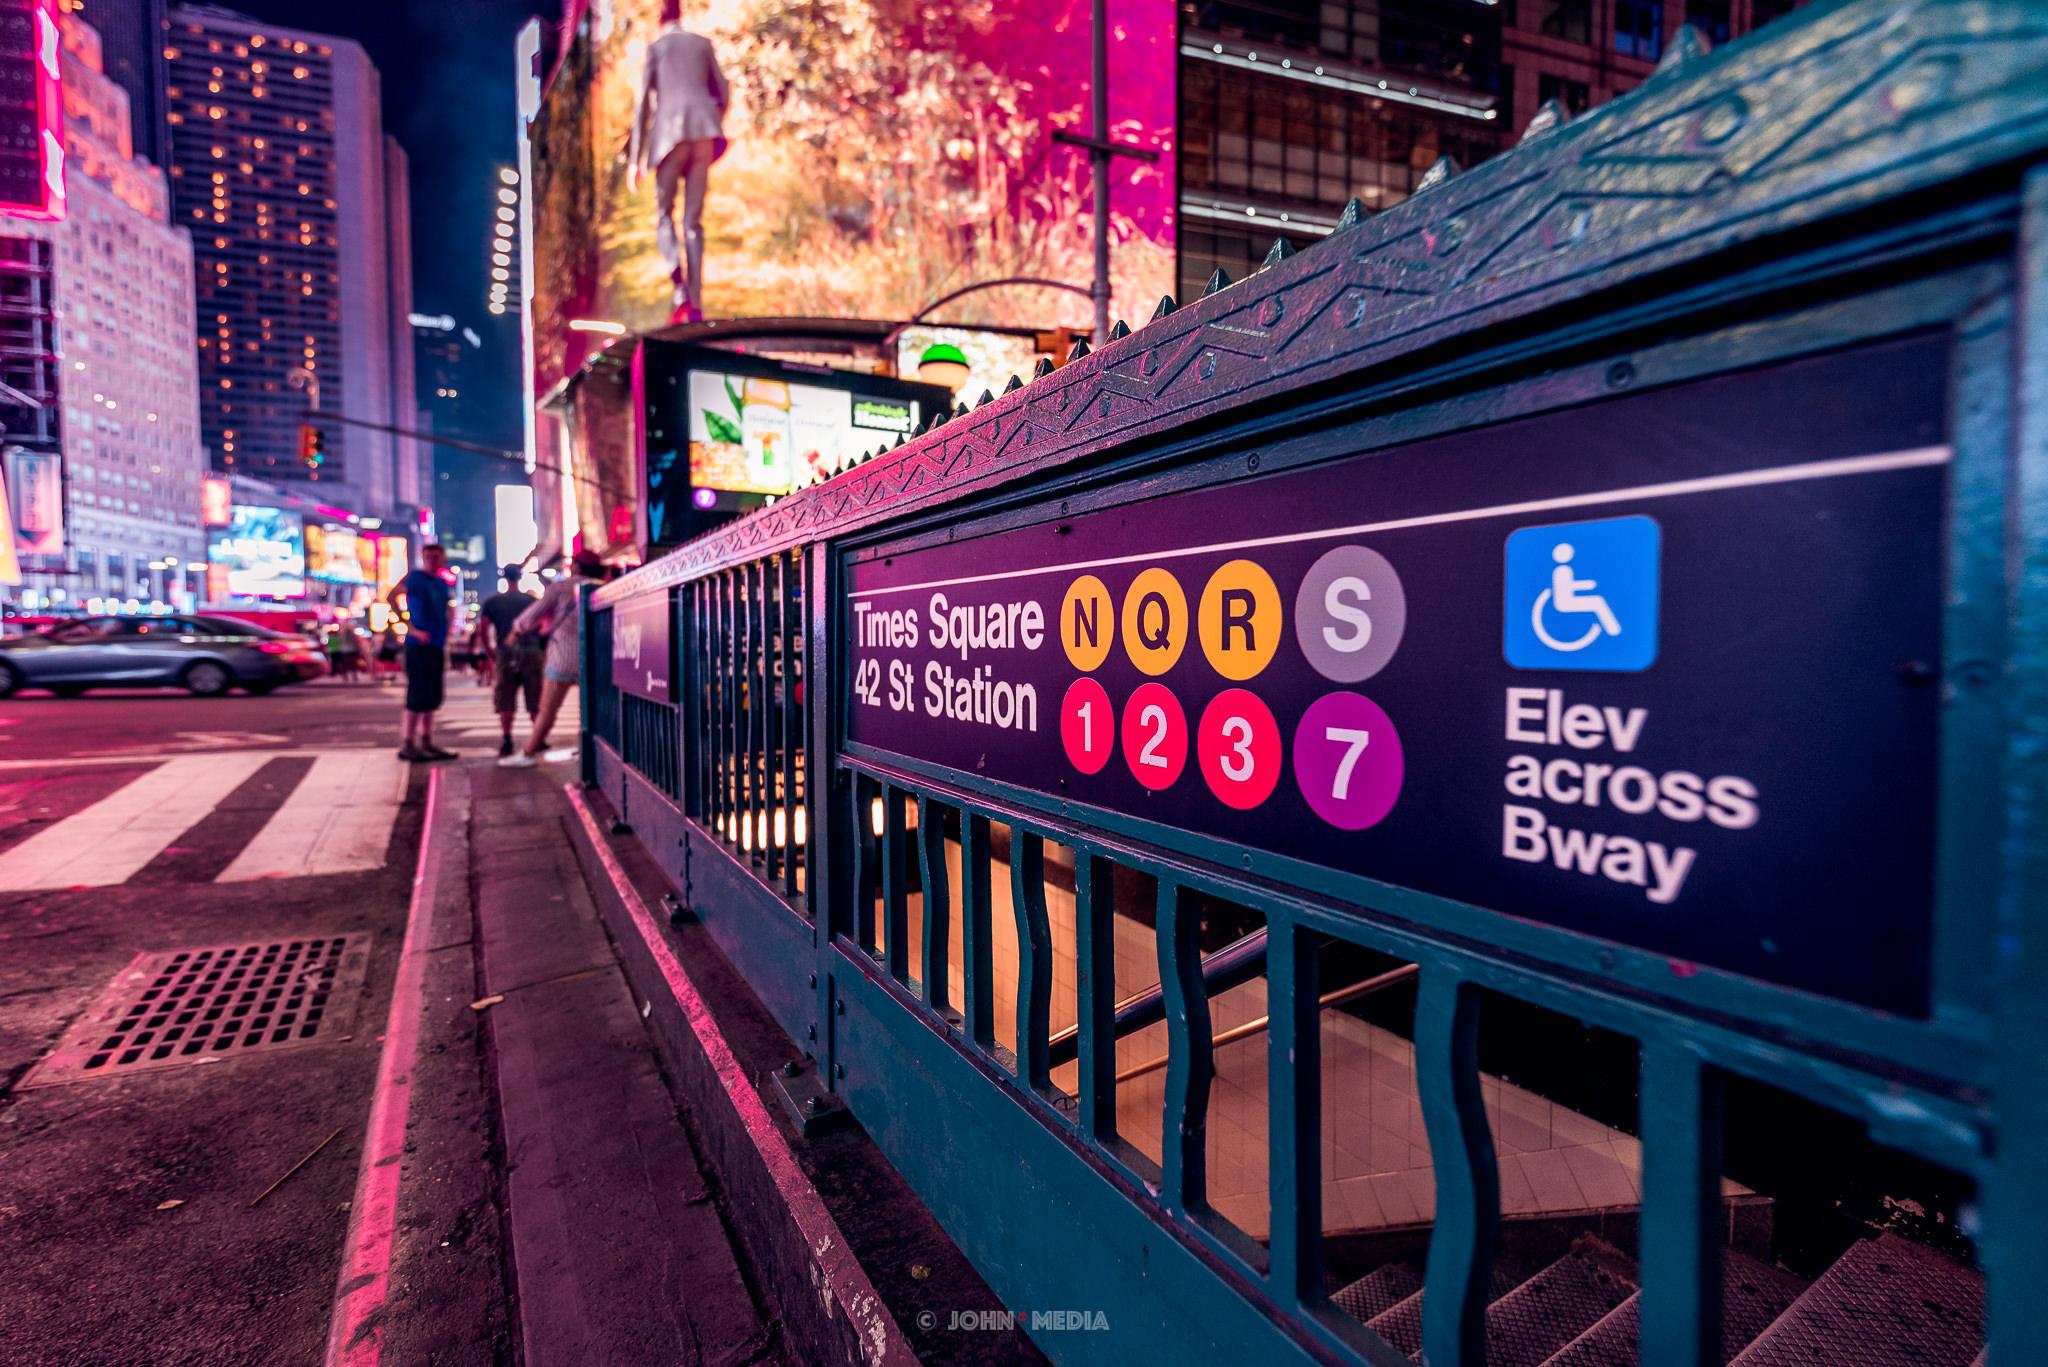 Times Square Metro